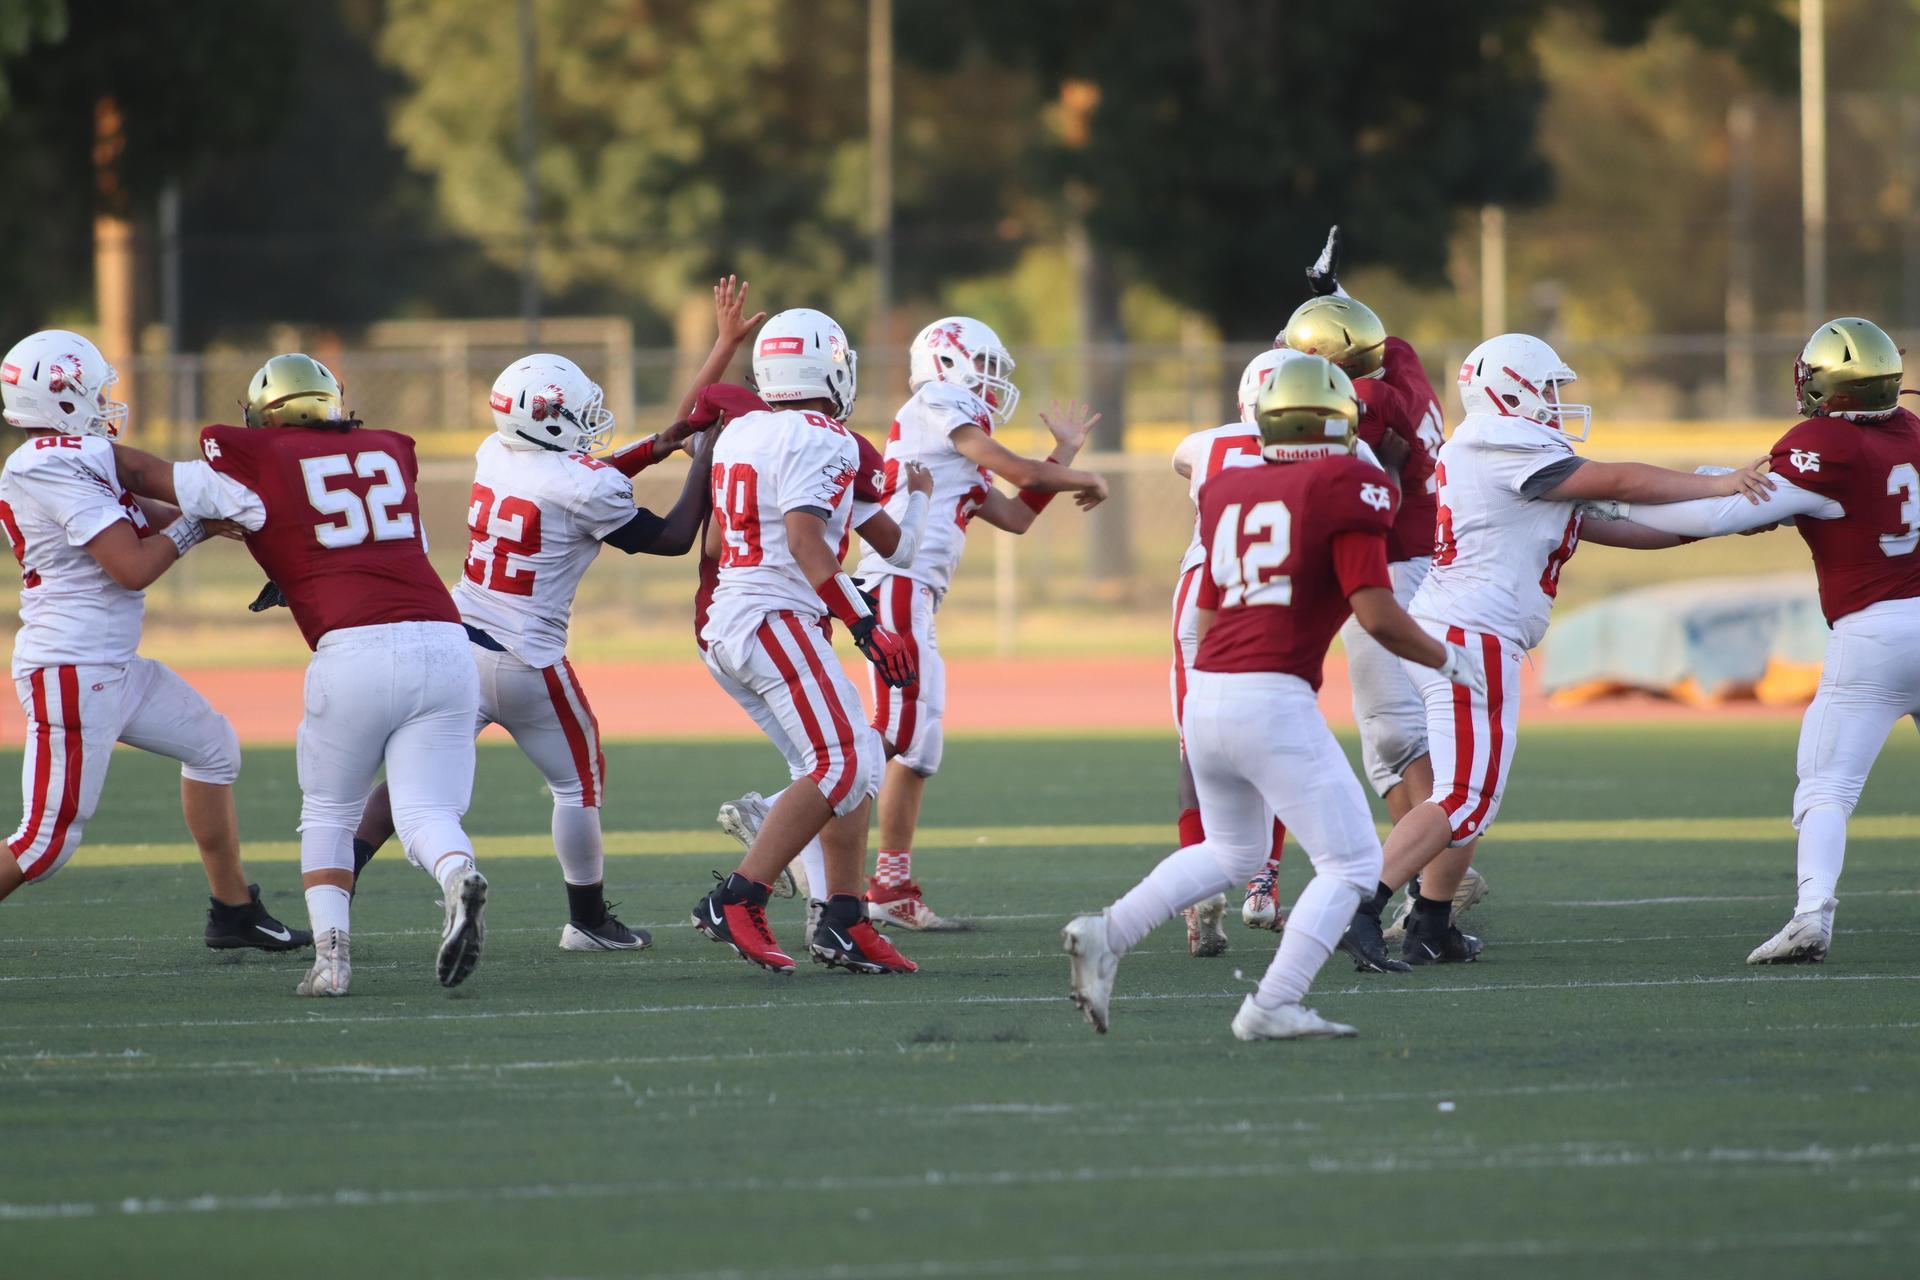 JV boys playing football against Golden Valley